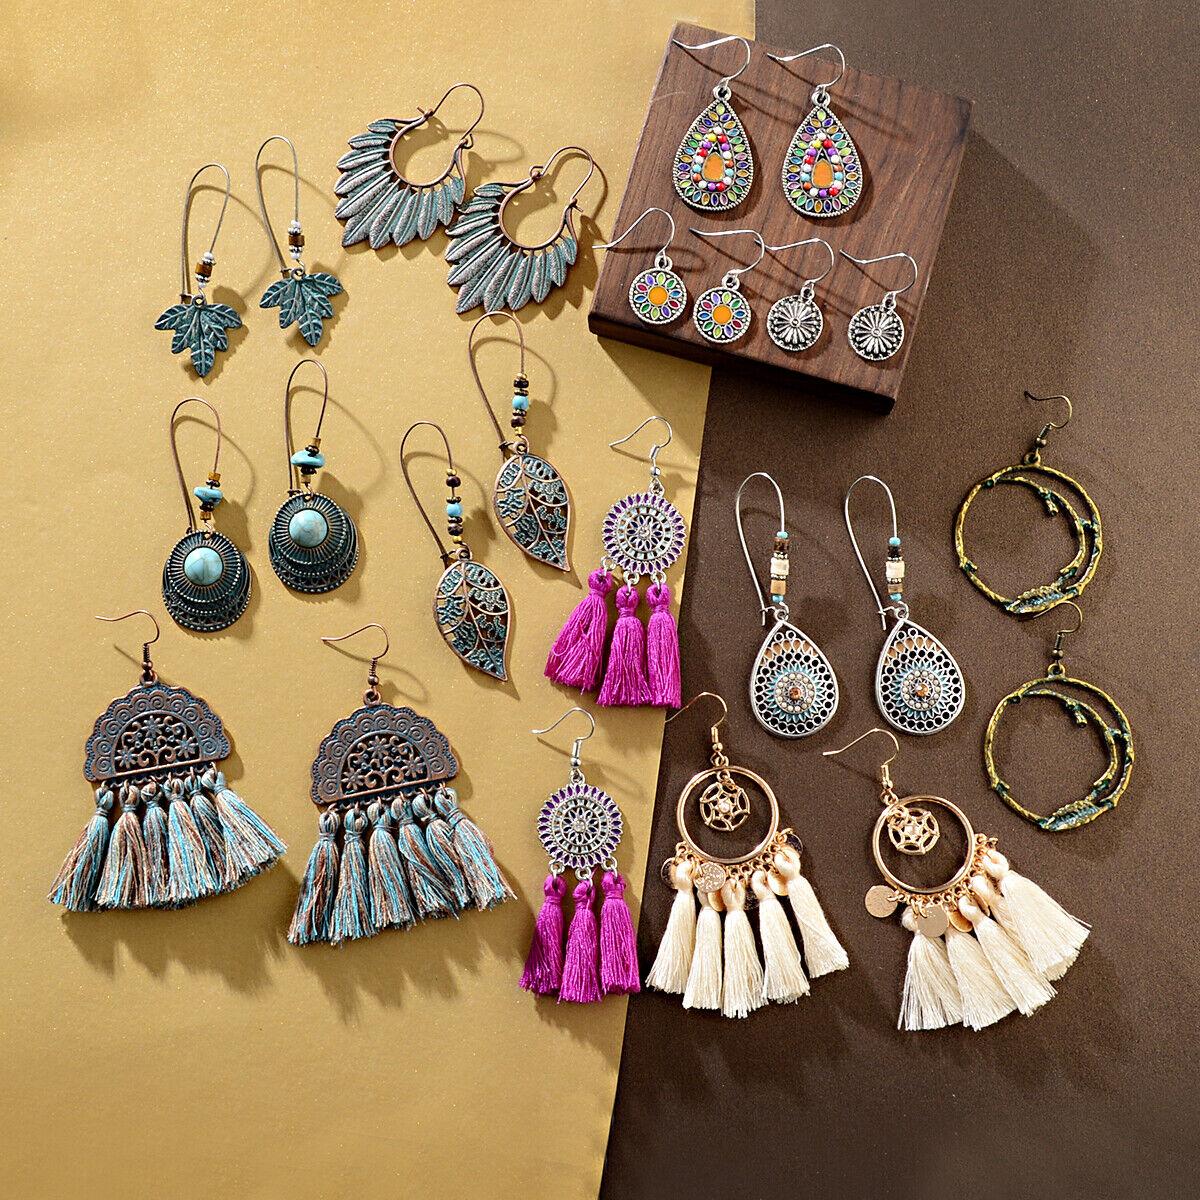 12 Pairs Women's Boho Earrings Dangle Pendant Earrings Long